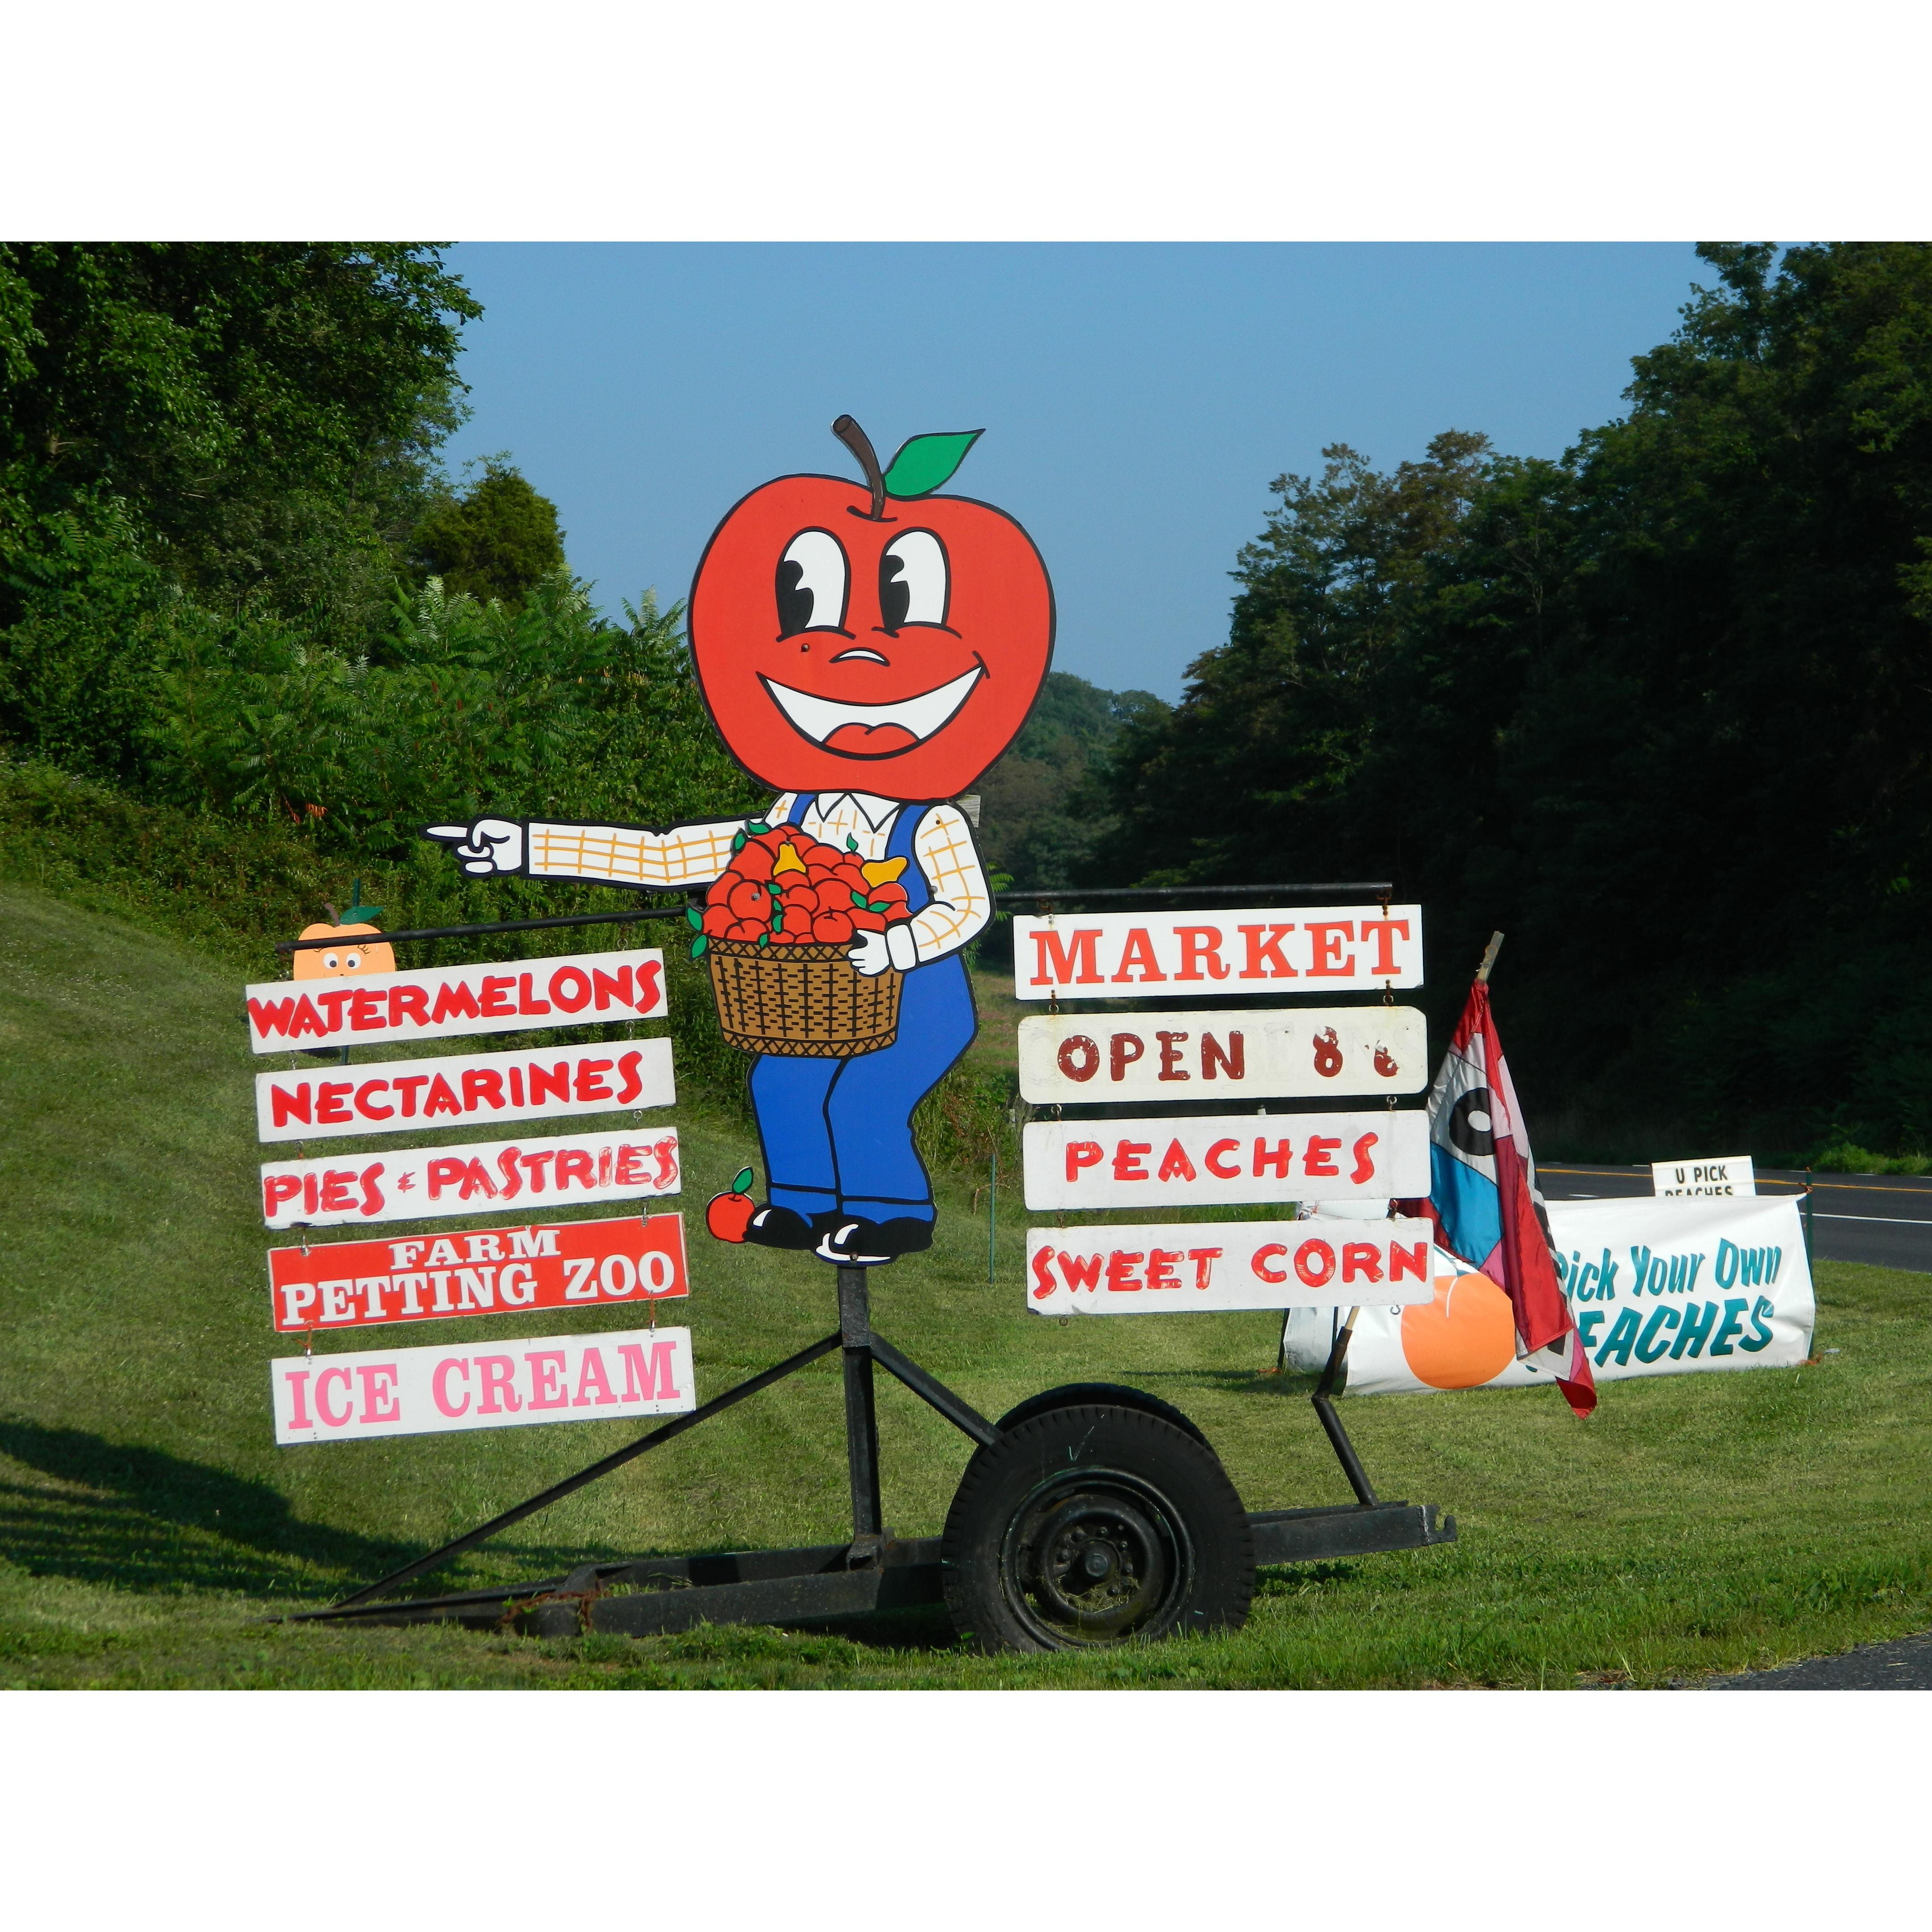 Baugher's Orchard & Farm